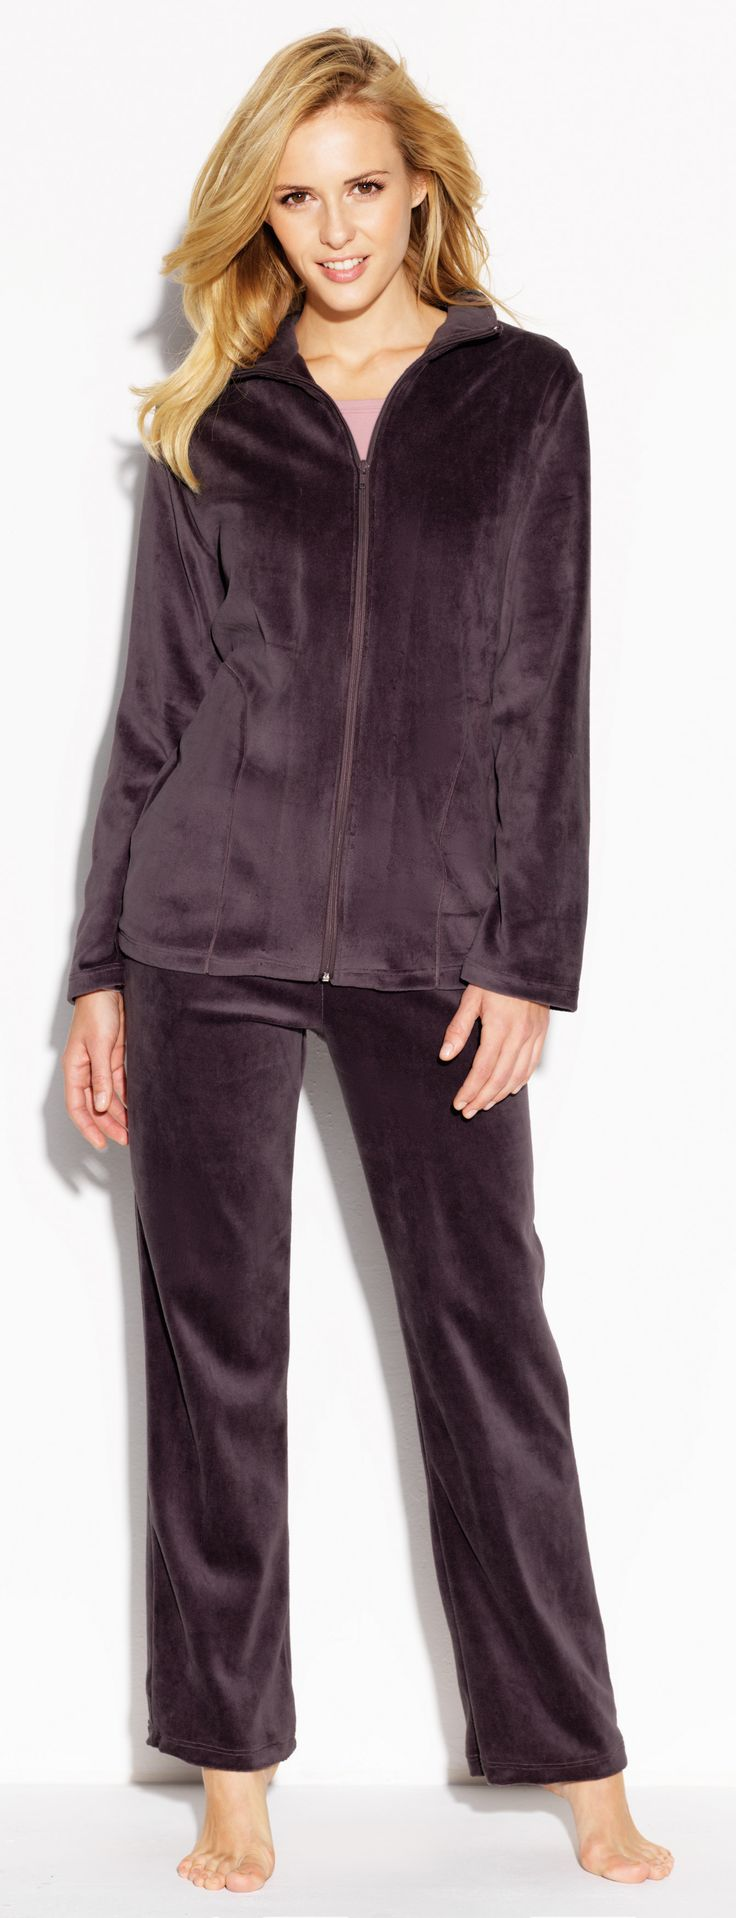 CYBÈLE Podzim-Zima 2015/2016   Volnočasové prádlo   Kabátek   Kalhoty   Loungewear   Jacket   Trousers   www.naturana-plavky-pradlo.cz